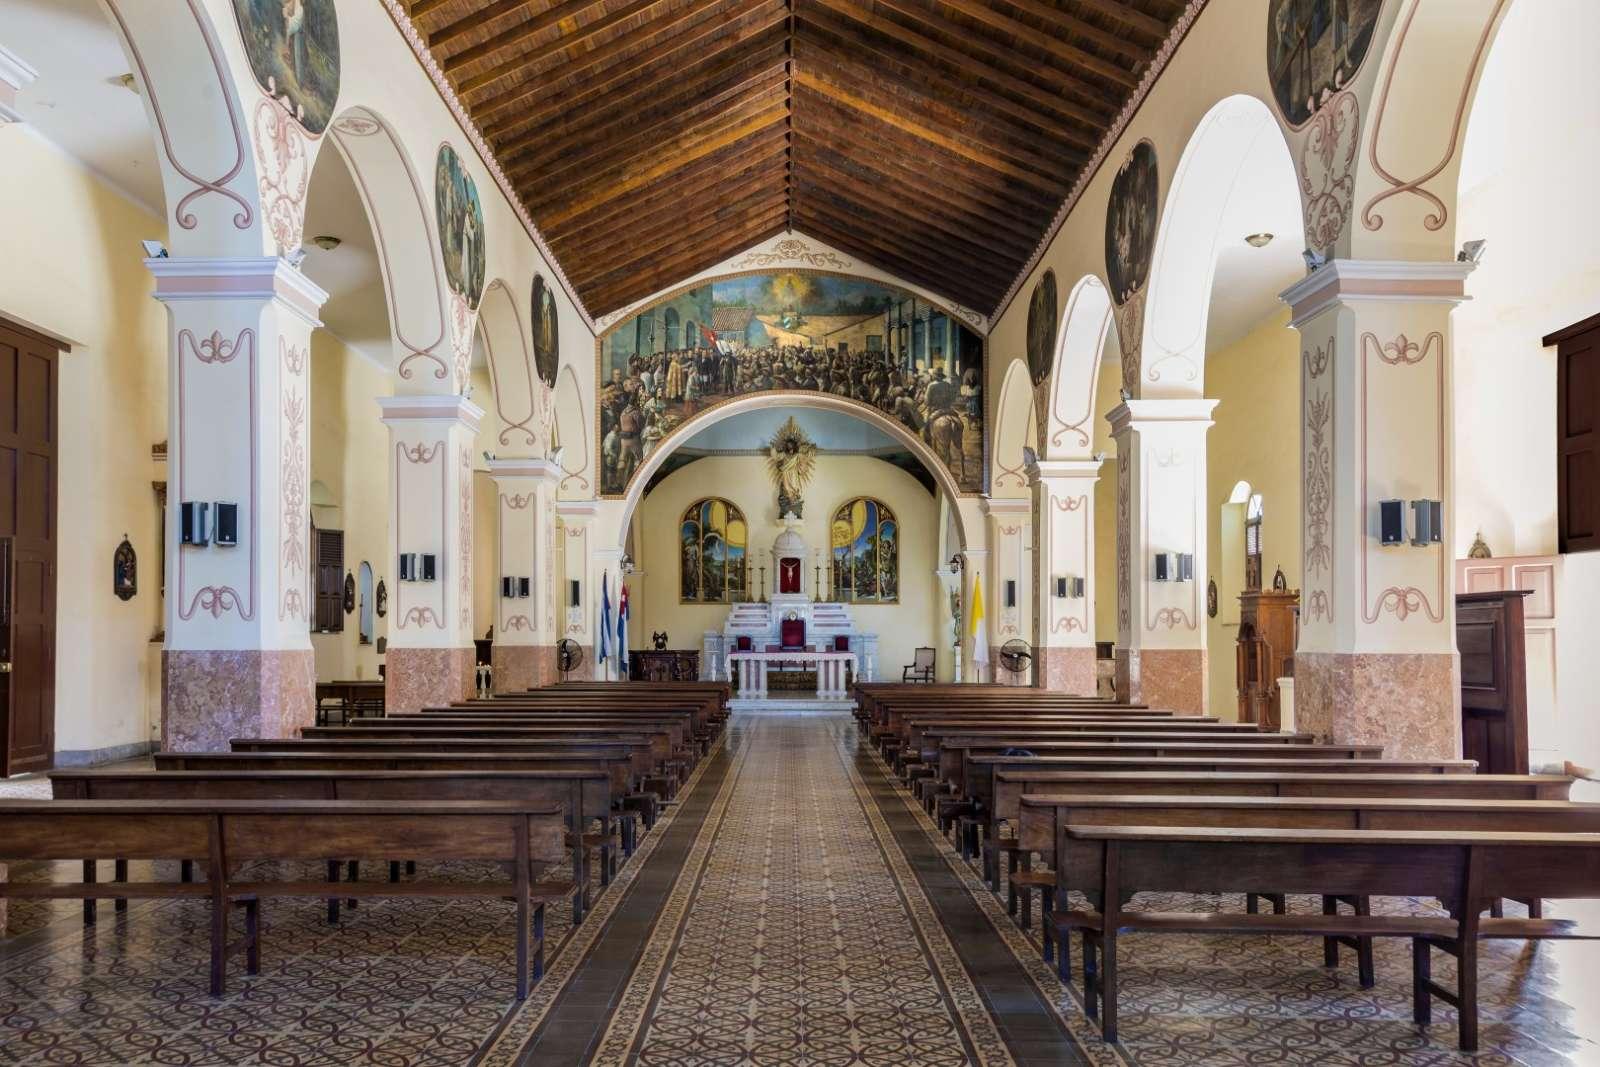 Interior of Bayamo cathedral in Cuba